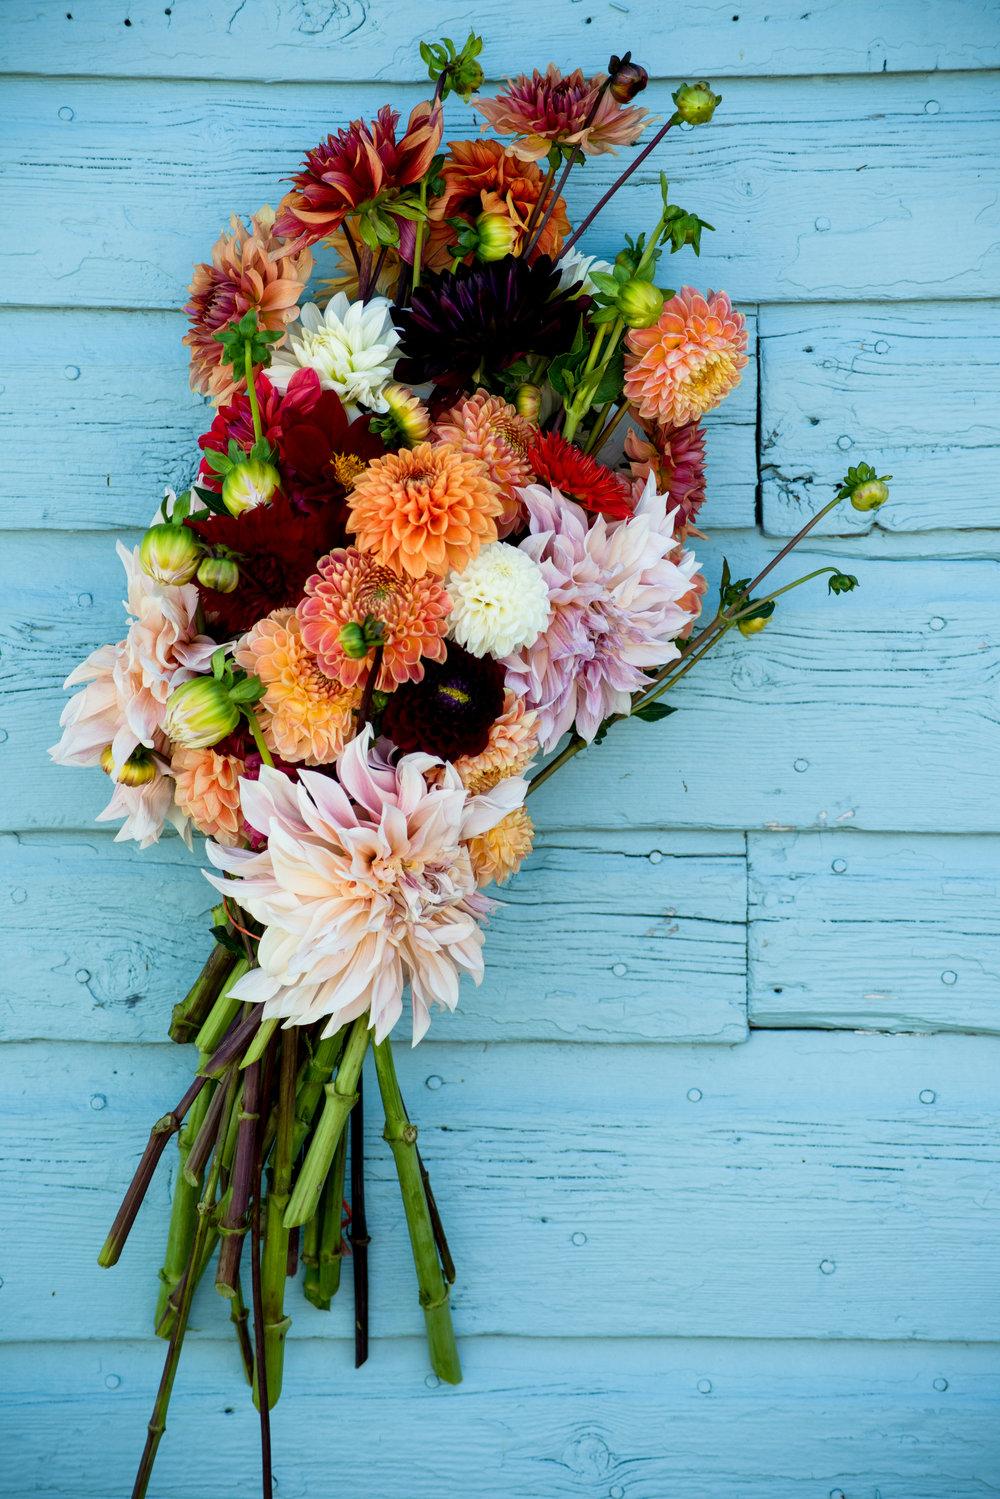 Flowers_RockyCreekFarm_Greener_Visuals_Photography_2018-4926.jpg